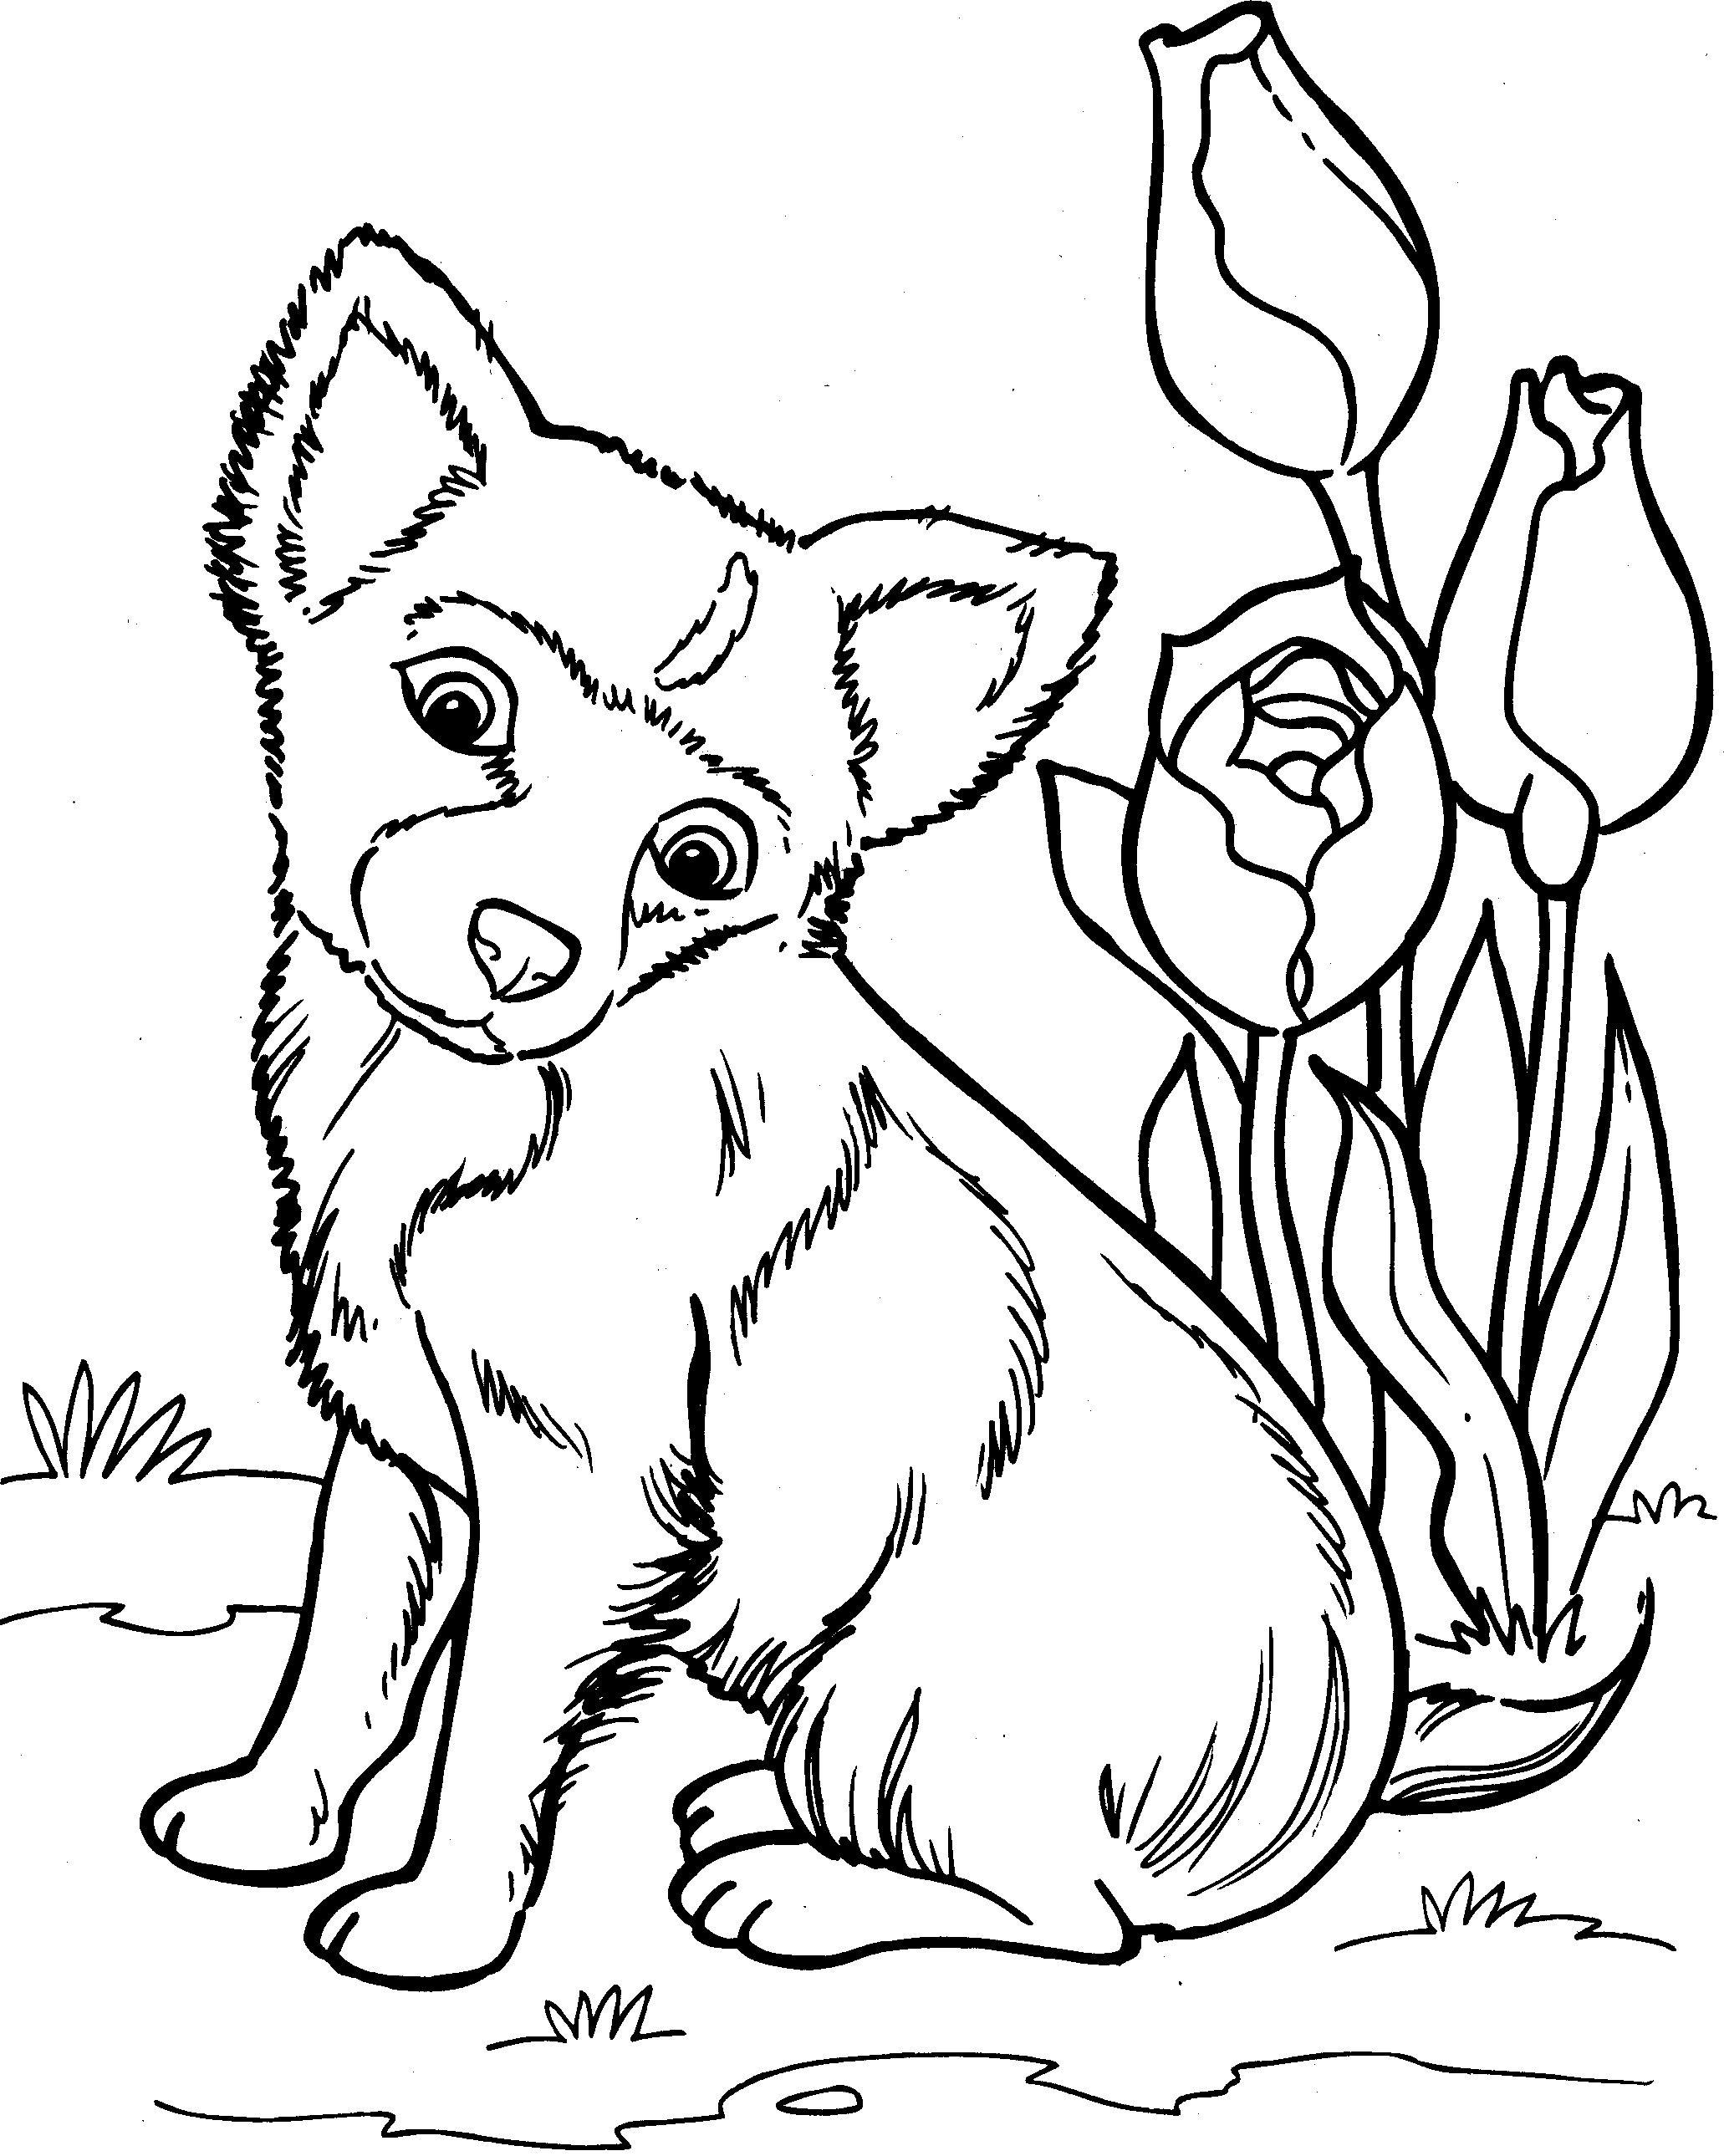 honden kleurplaat dog coloring page disney coloring pages free printable coloring pages coloring